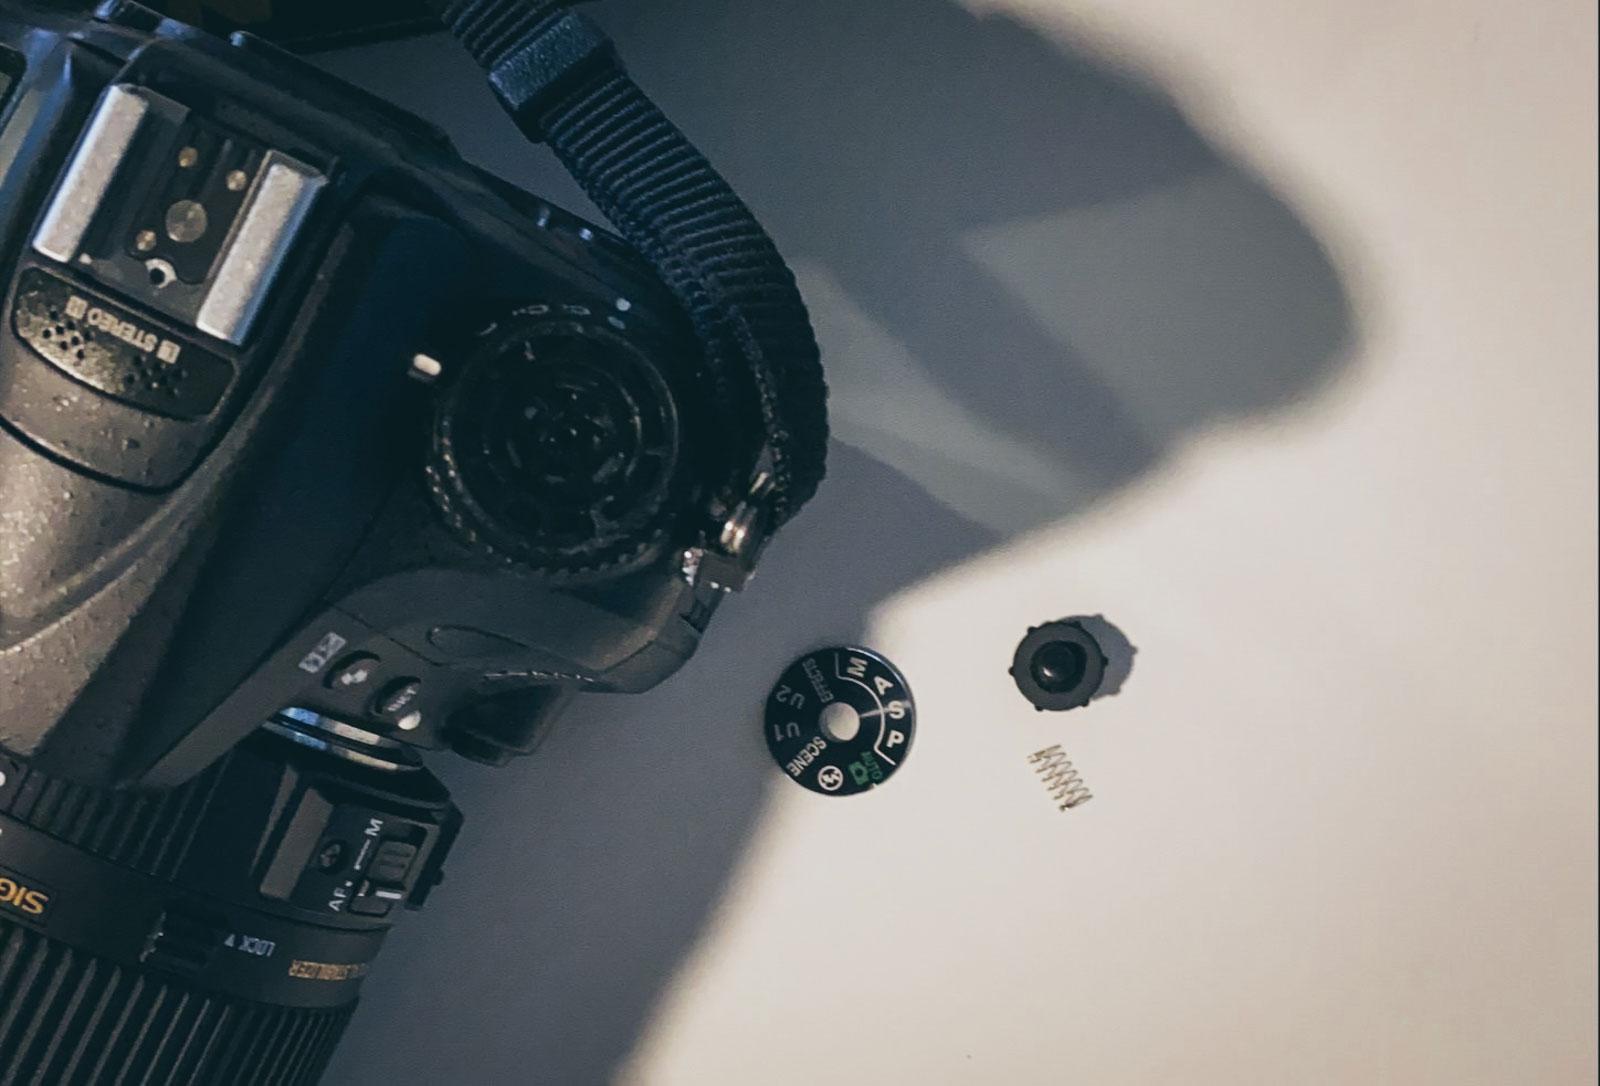 DSL camera with a piece broken off.